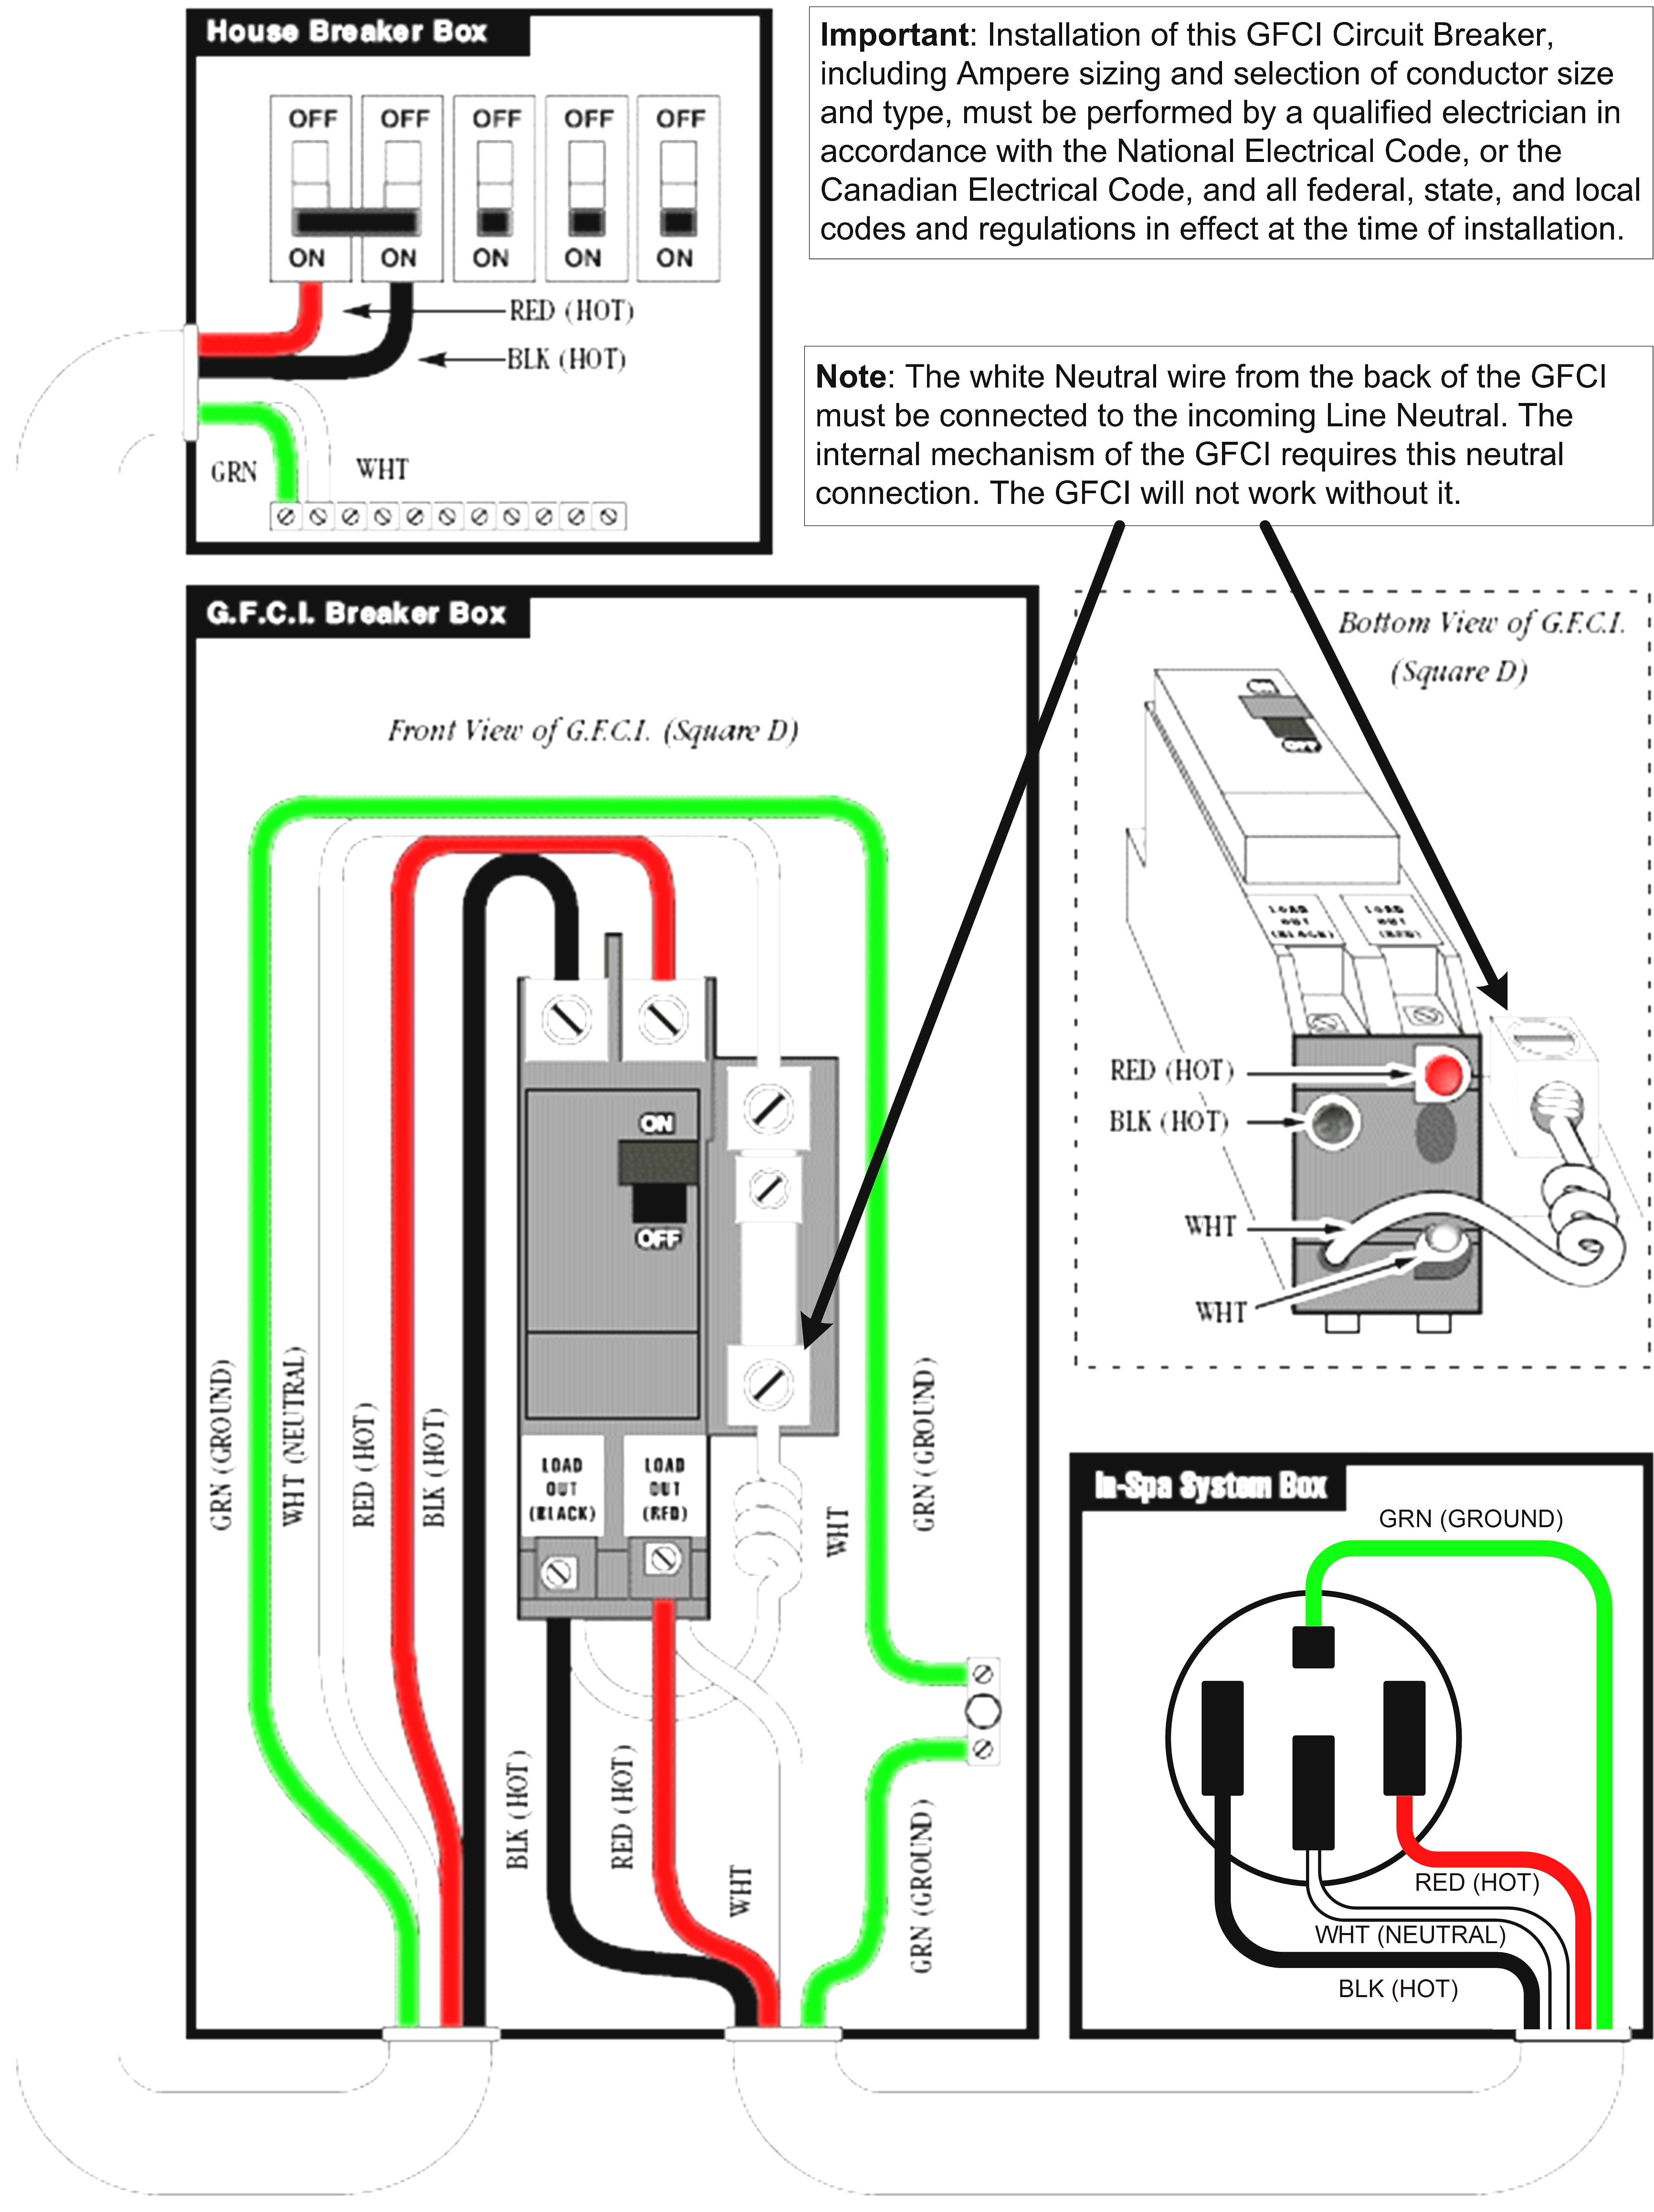 gfci breaker wiring diagram elegant gfi troubleshooting gallery free rh thespartanchronicle Electric Breaker Box Wiring Diagram GFCI Plug Wiring Diagram